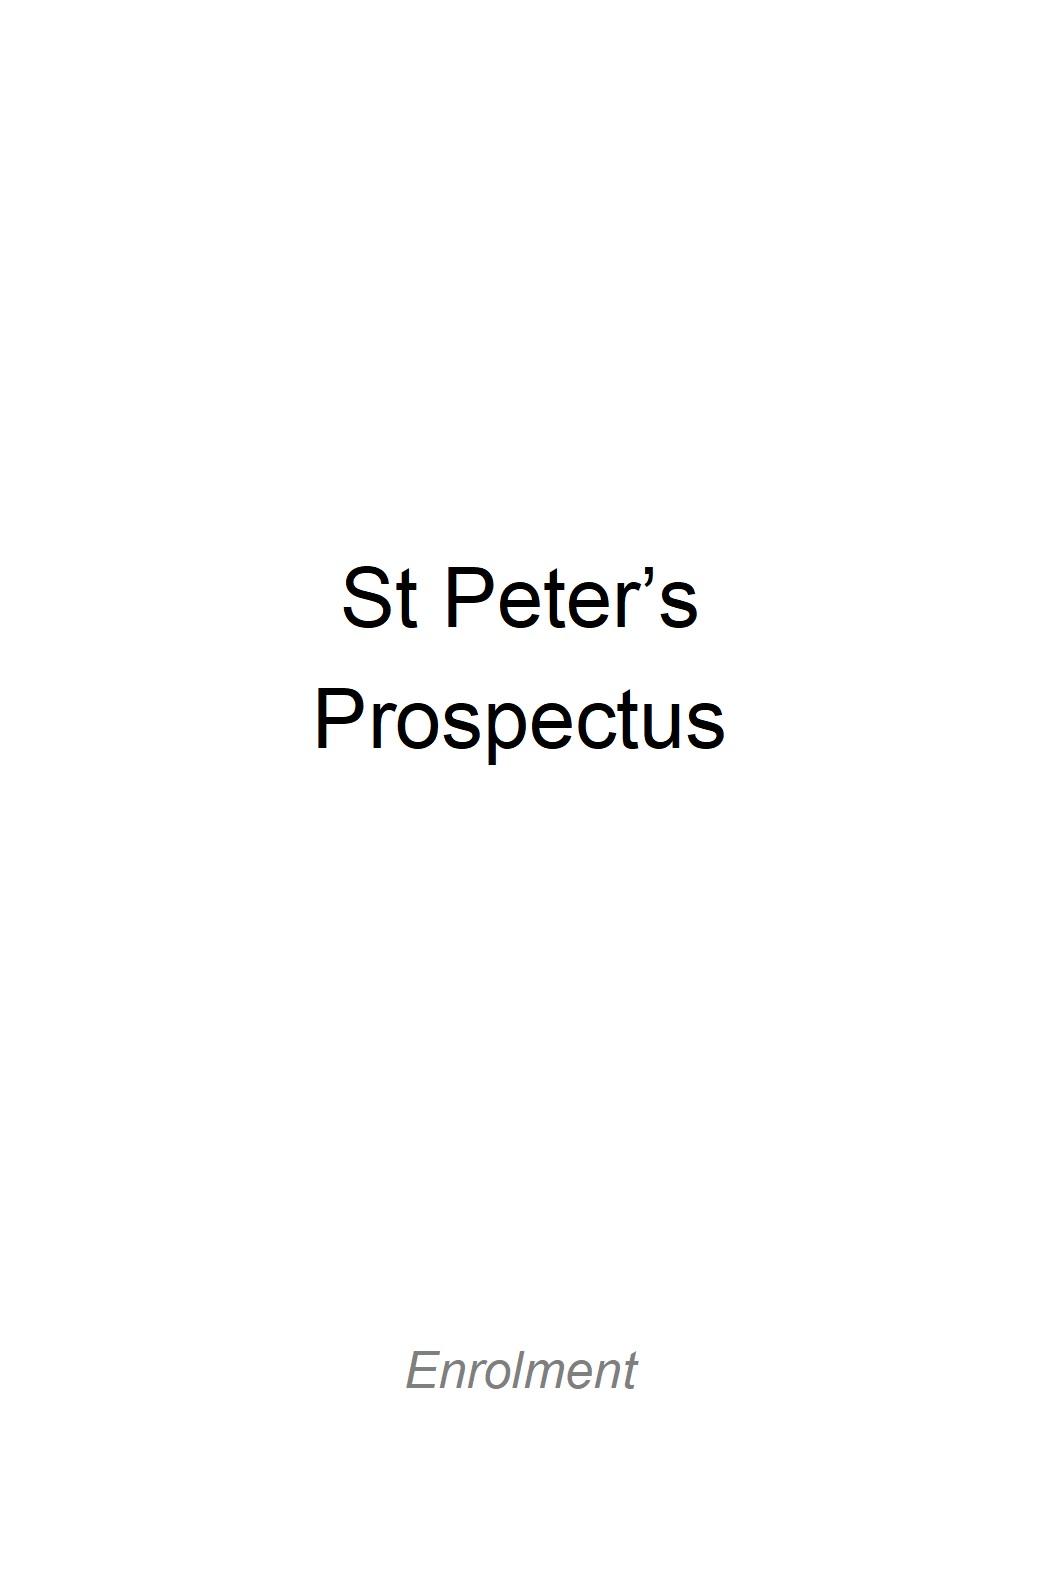 St Peter's Prospectus